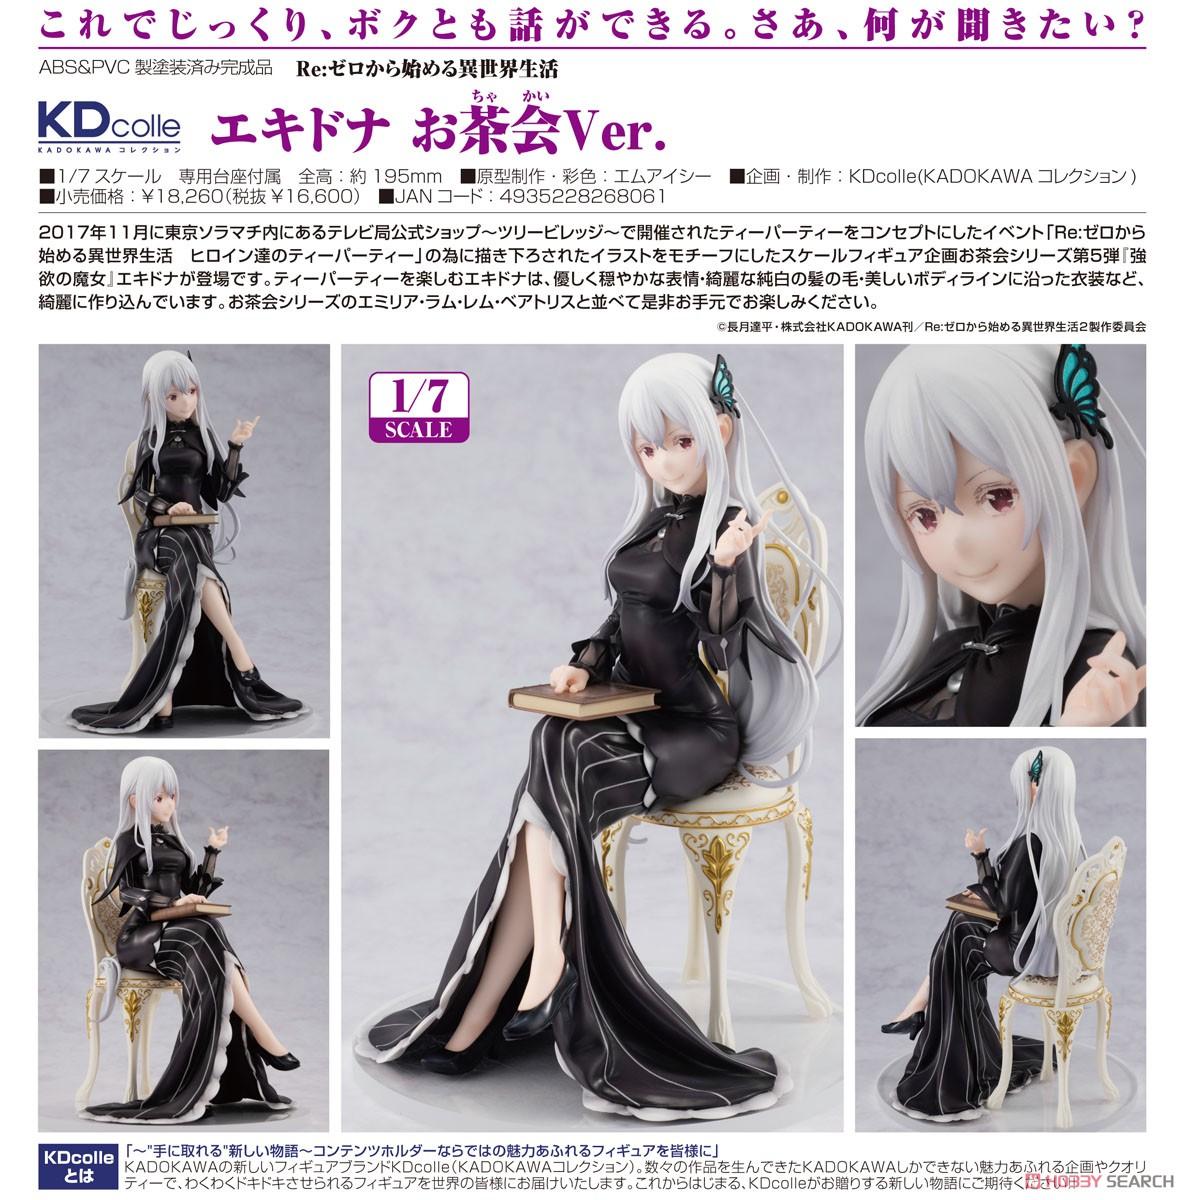 KDcolle『エキドナ お茶会Ver.』Re:ゼロから始める異世界生活 1/7 完成品フィギュア-009